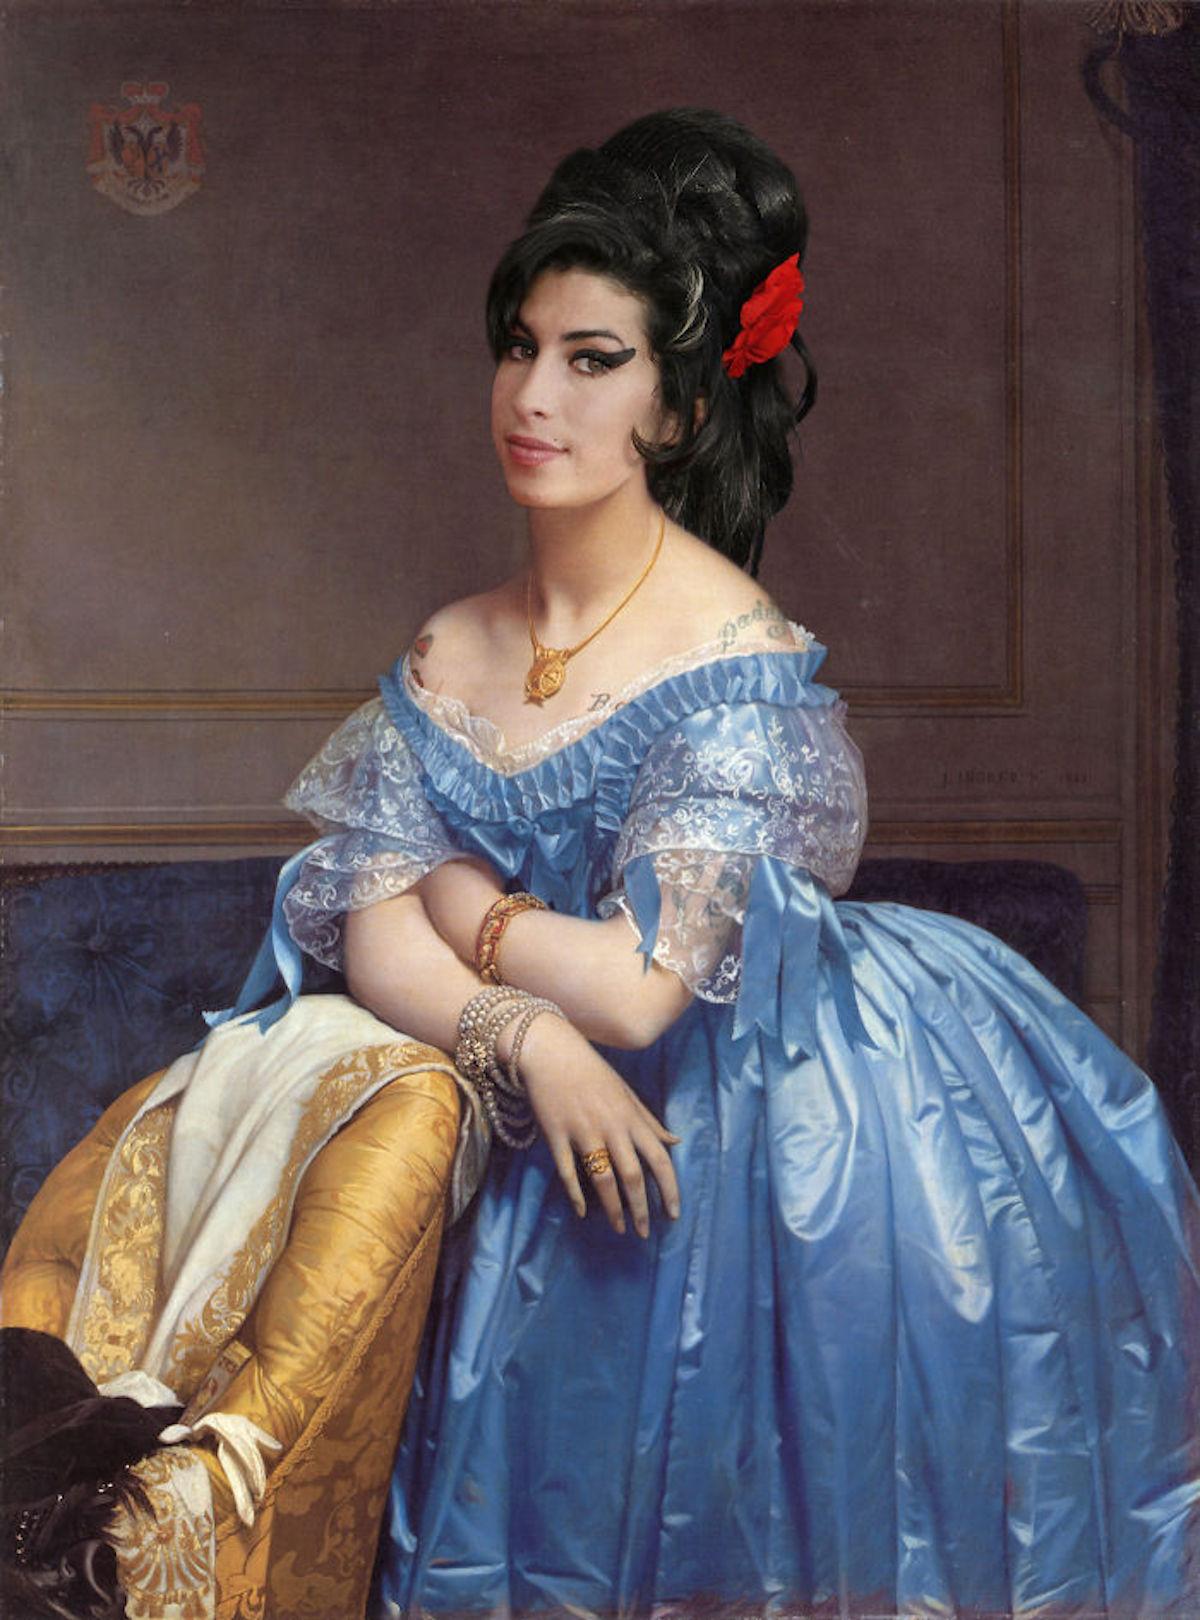 Amy Winehouse Art Digital Design Crowd